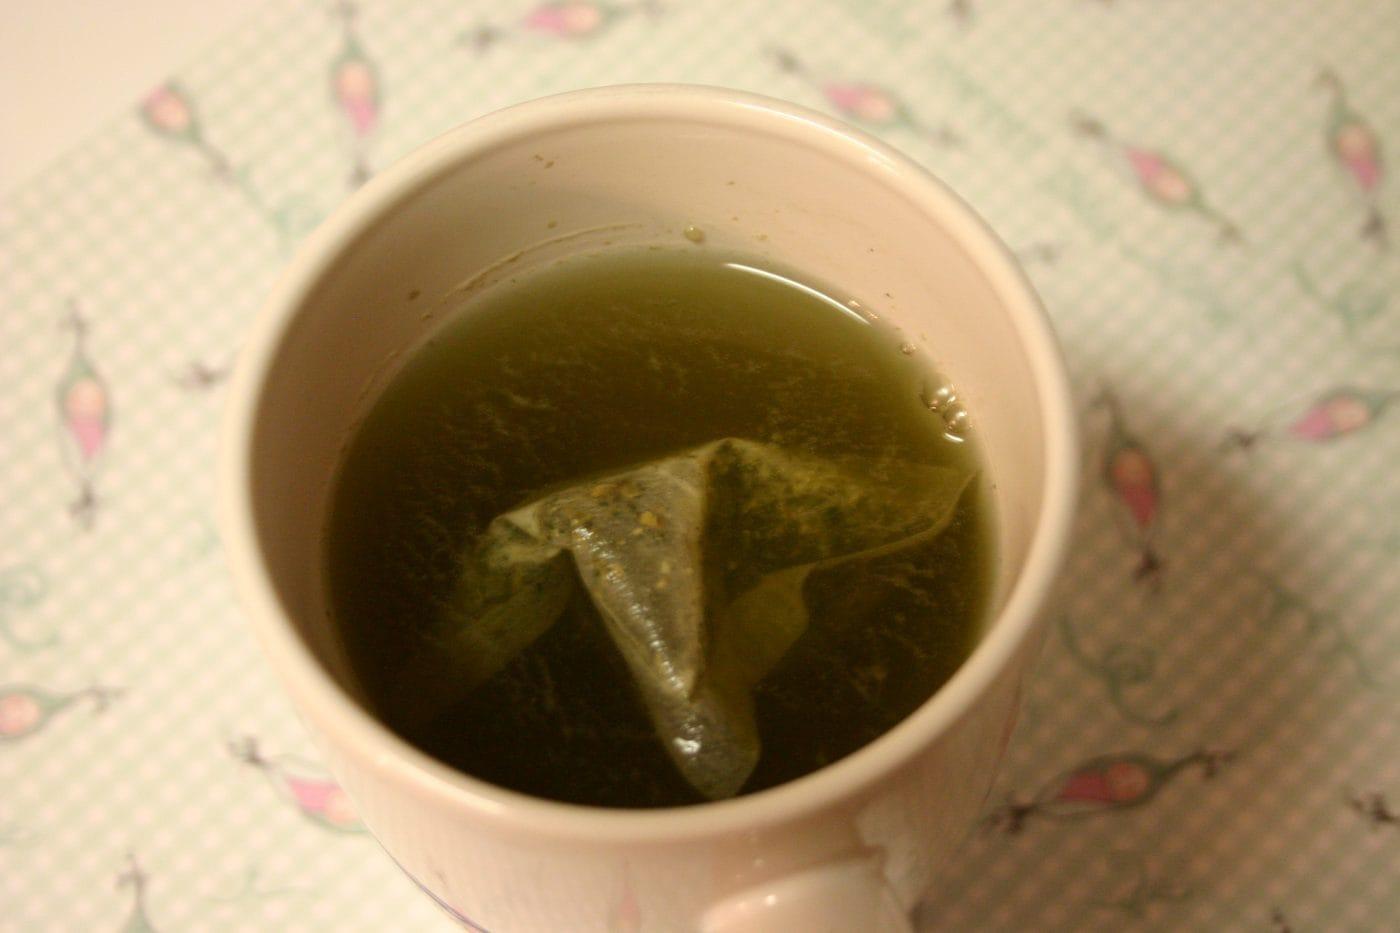 Earth Mama Milkmaid Tea Review